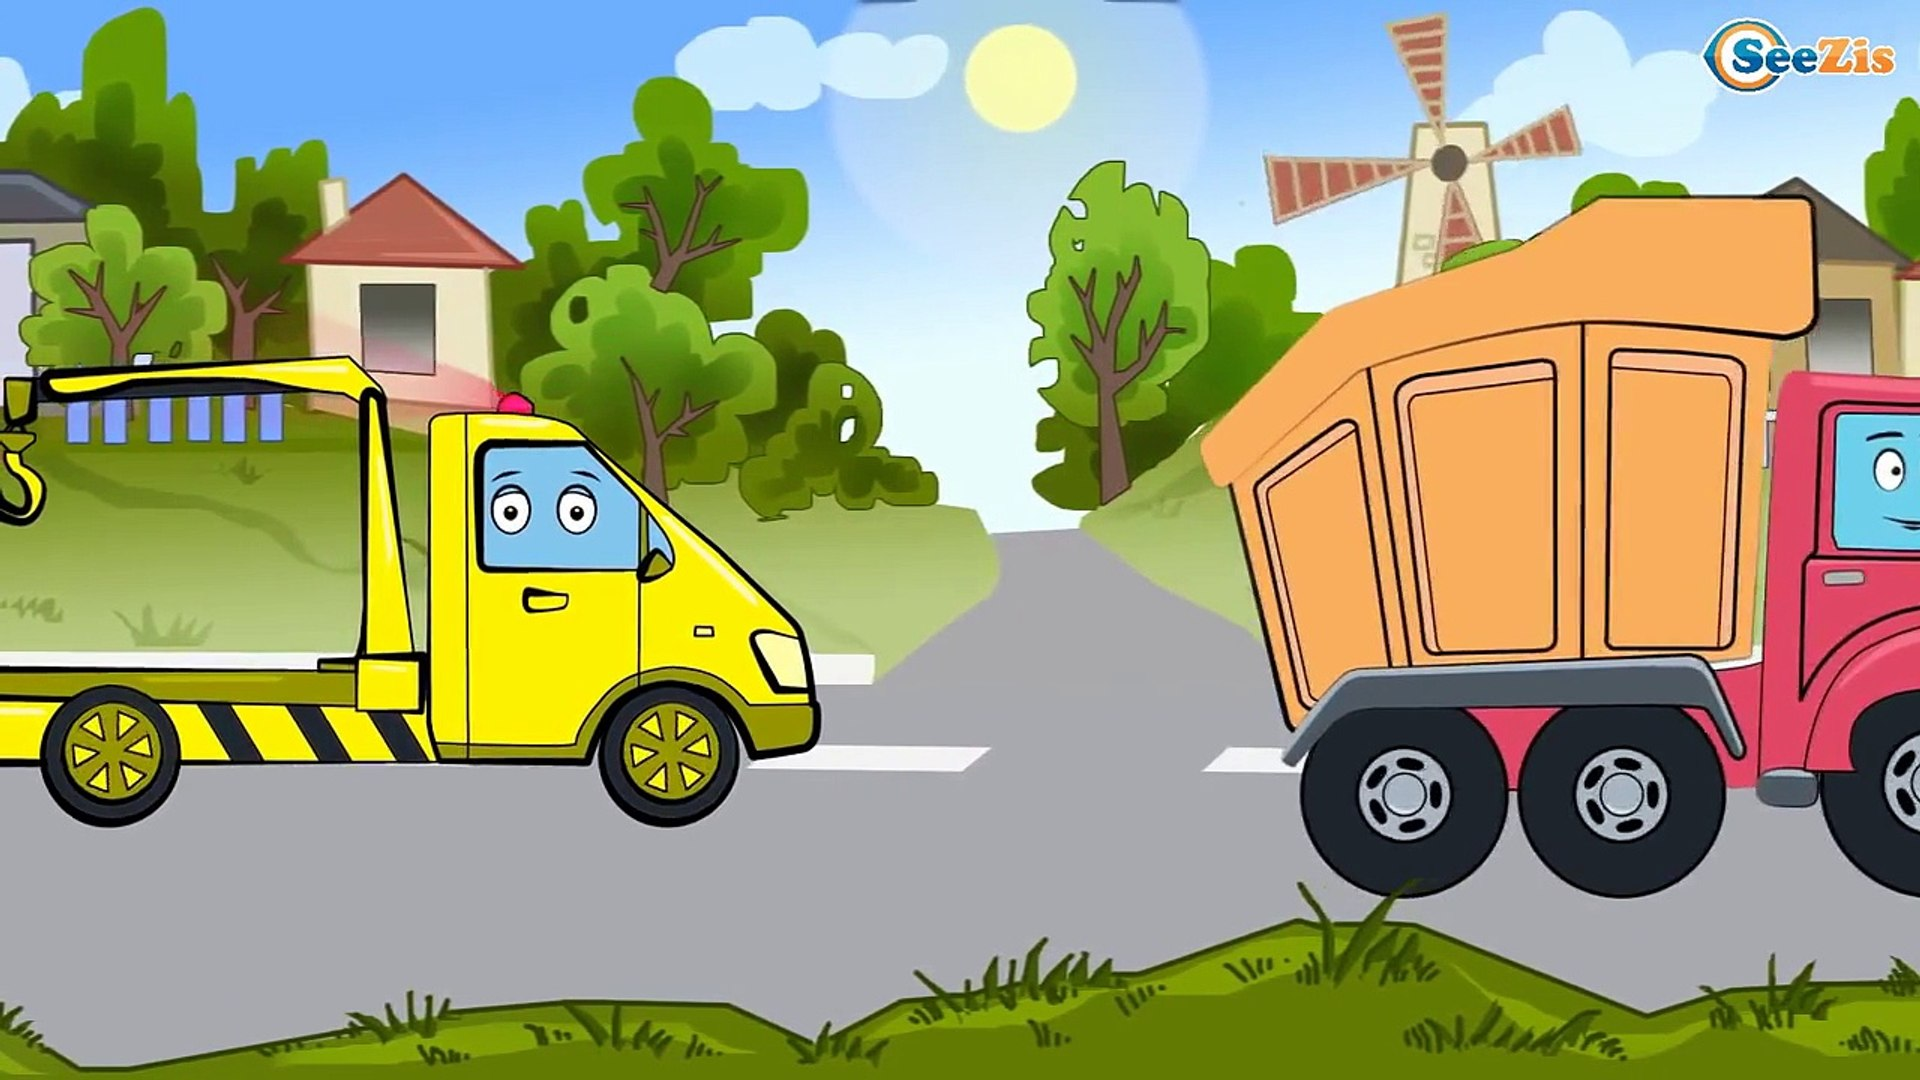 ✔ МУЛЬТИКИ  МАШИНКИ ВСЕ СЕРИИ. Грузовичок и его приключения в городе и на стройке! Video for Kids!